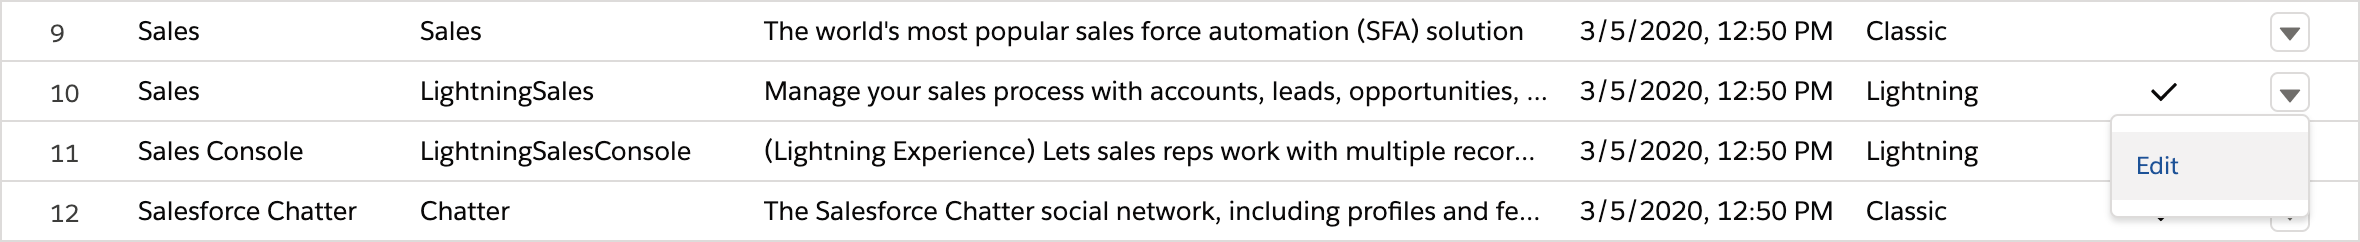 Sales app edit menu